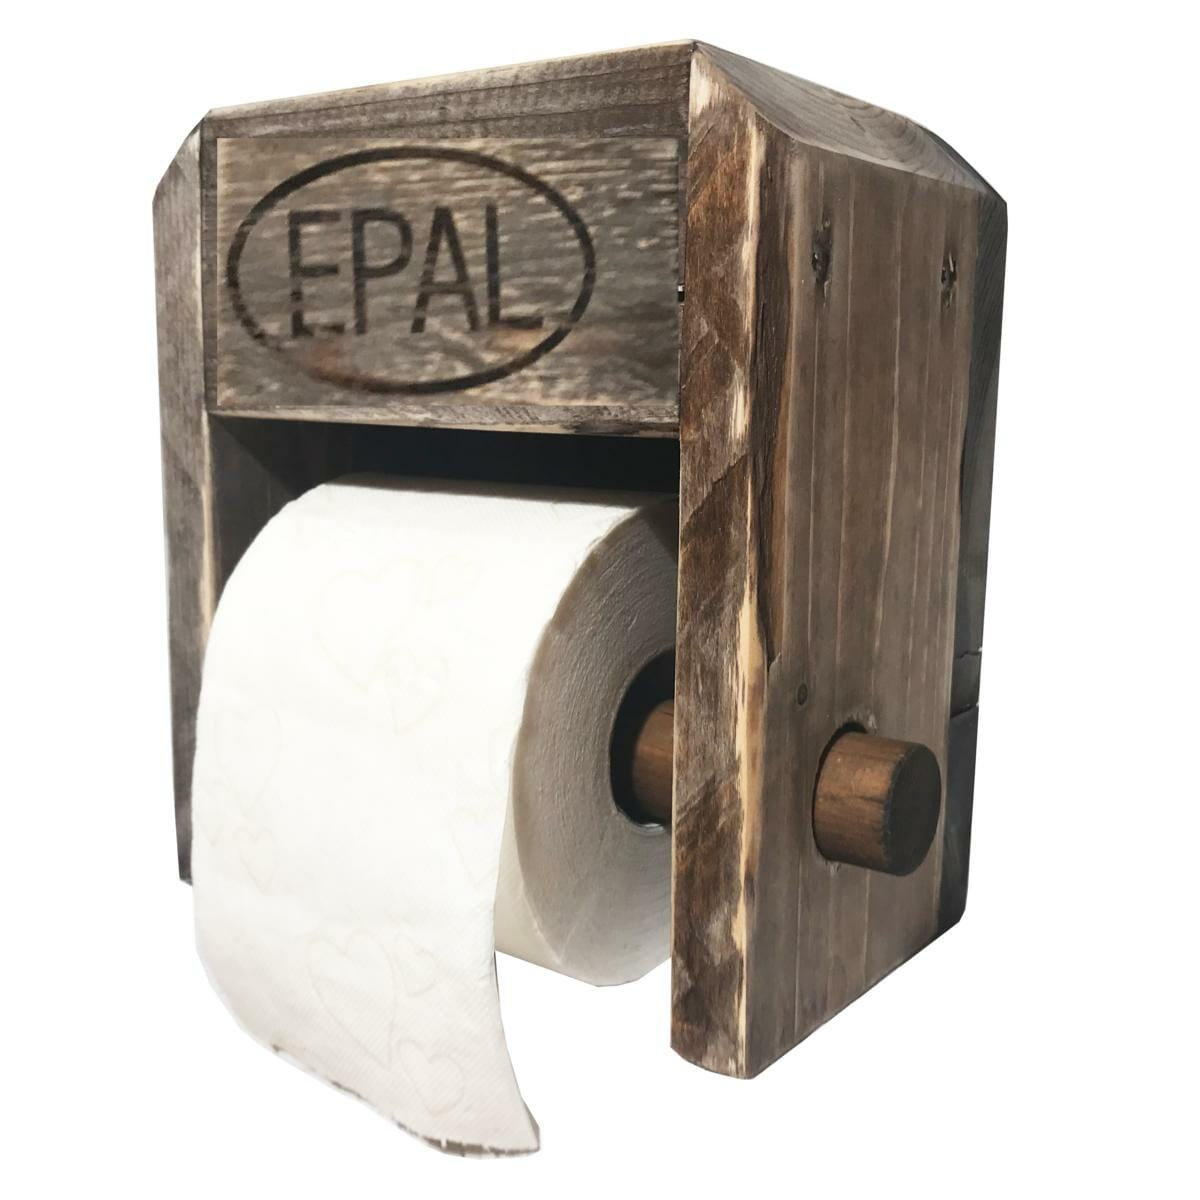 toilettenpapier halterung aus palettenholz europaletten m bel shop. Black Bedroom Furniture Sets. Home Design Ideas